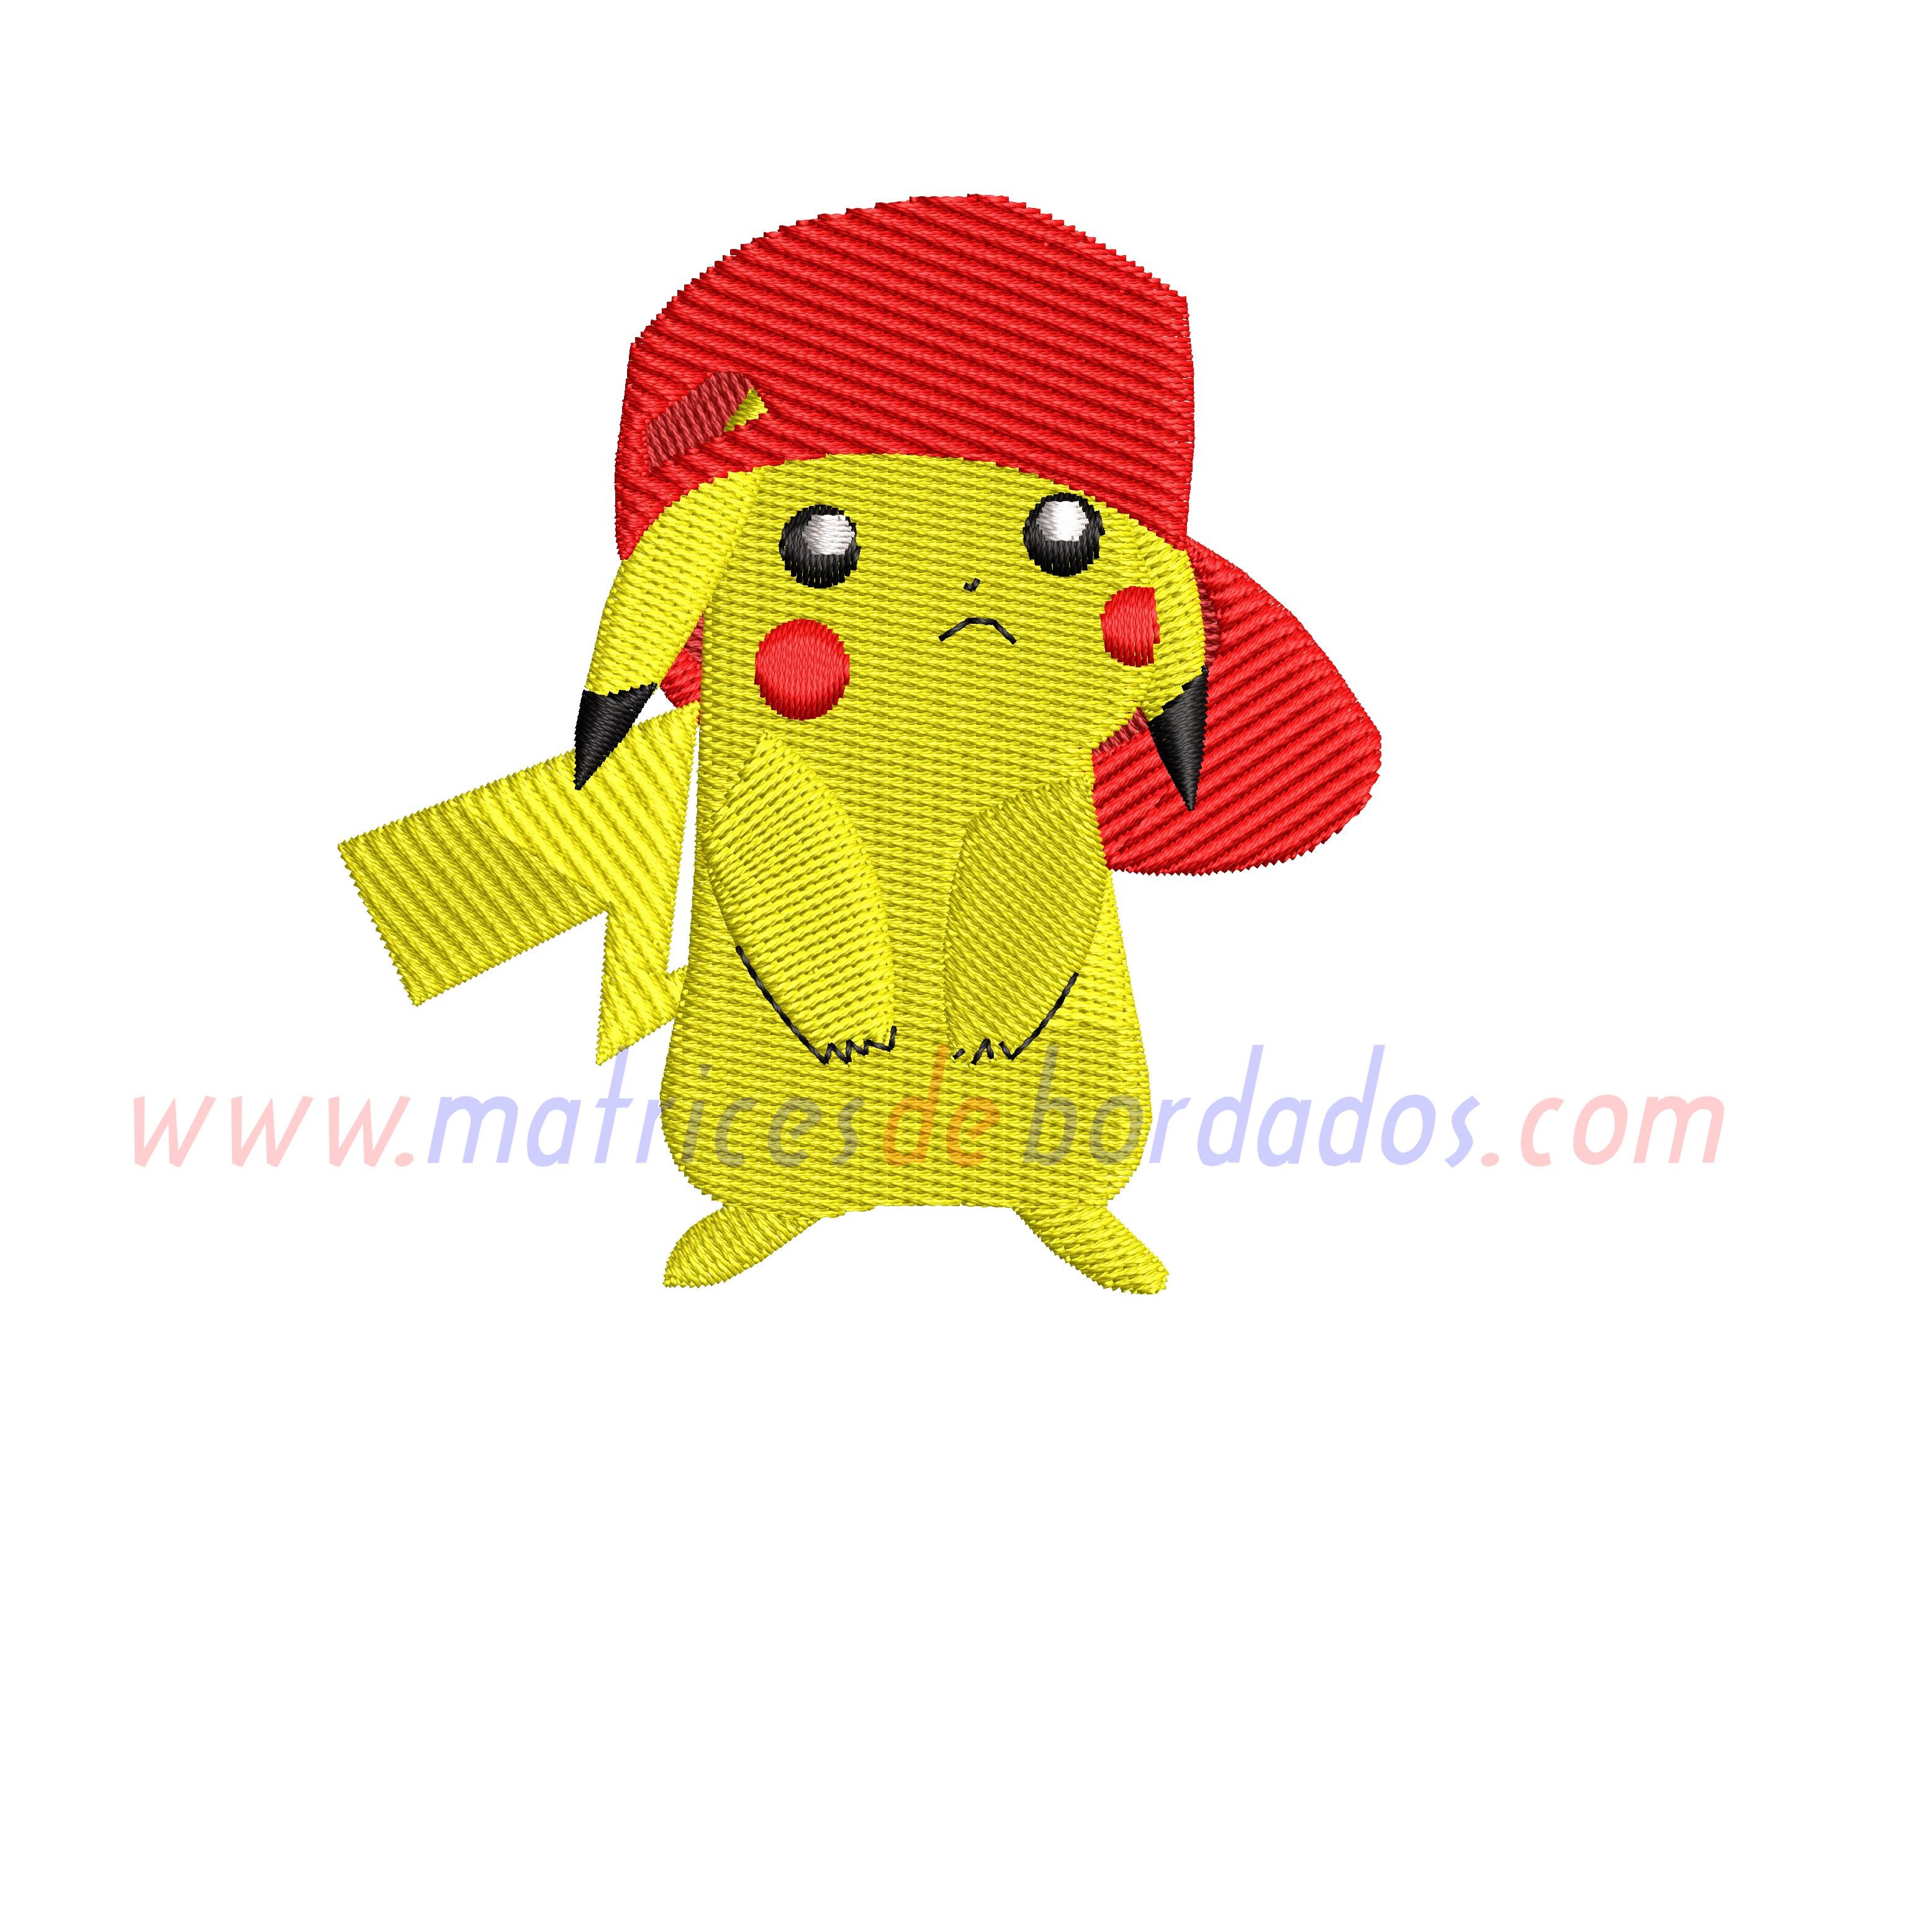 RF98YQ - Pikachu